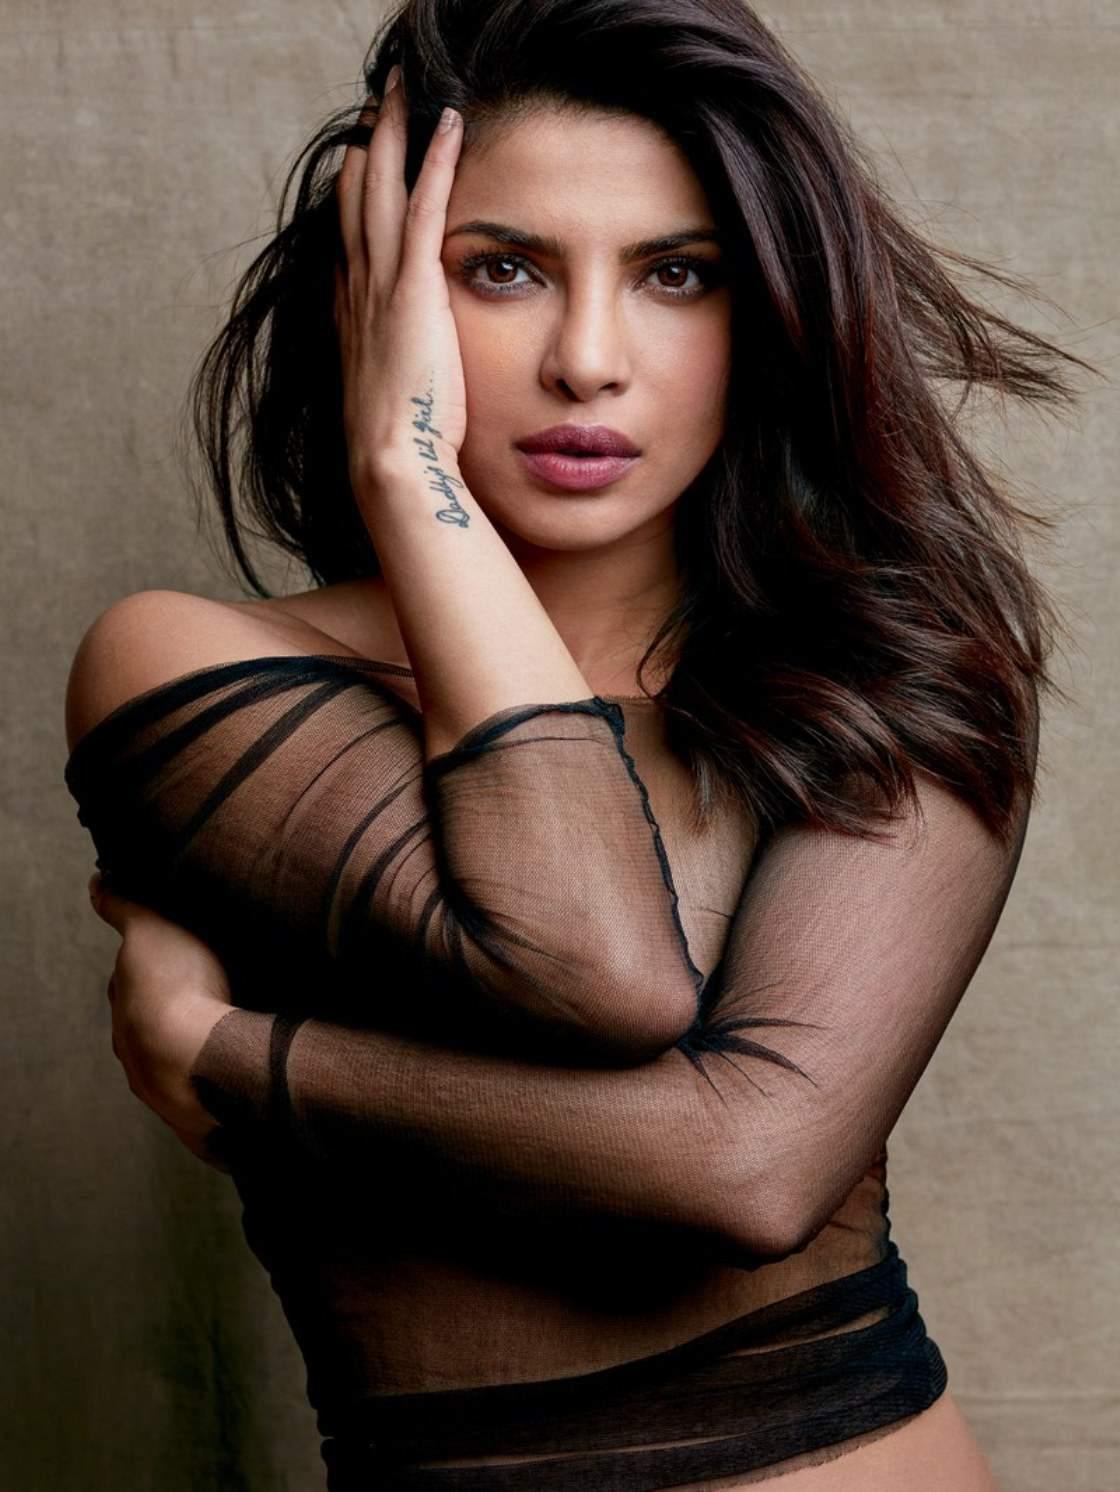 Priyanka Chopra GQ 2016 September Photoshoot Pic1